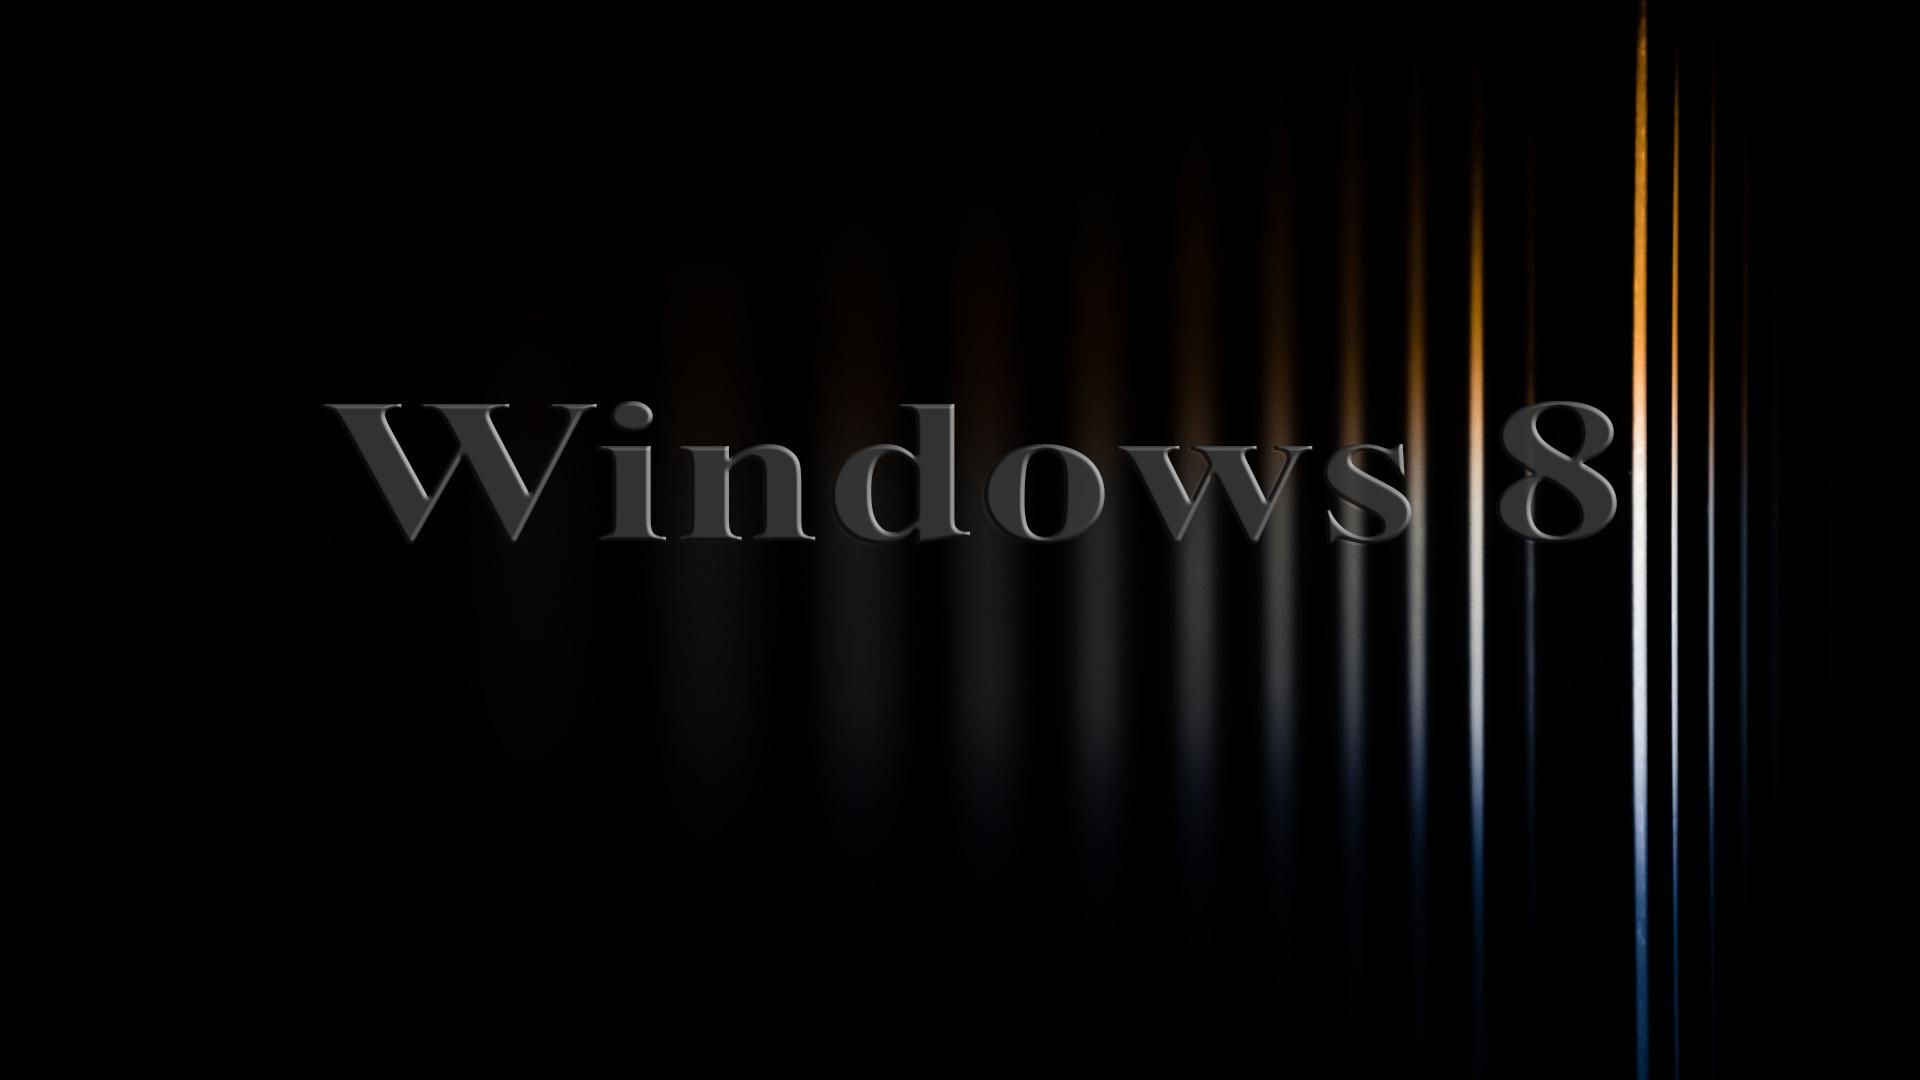 Fonds D Ecran Windows 8 Windows Ordinateur Telecharger Photo